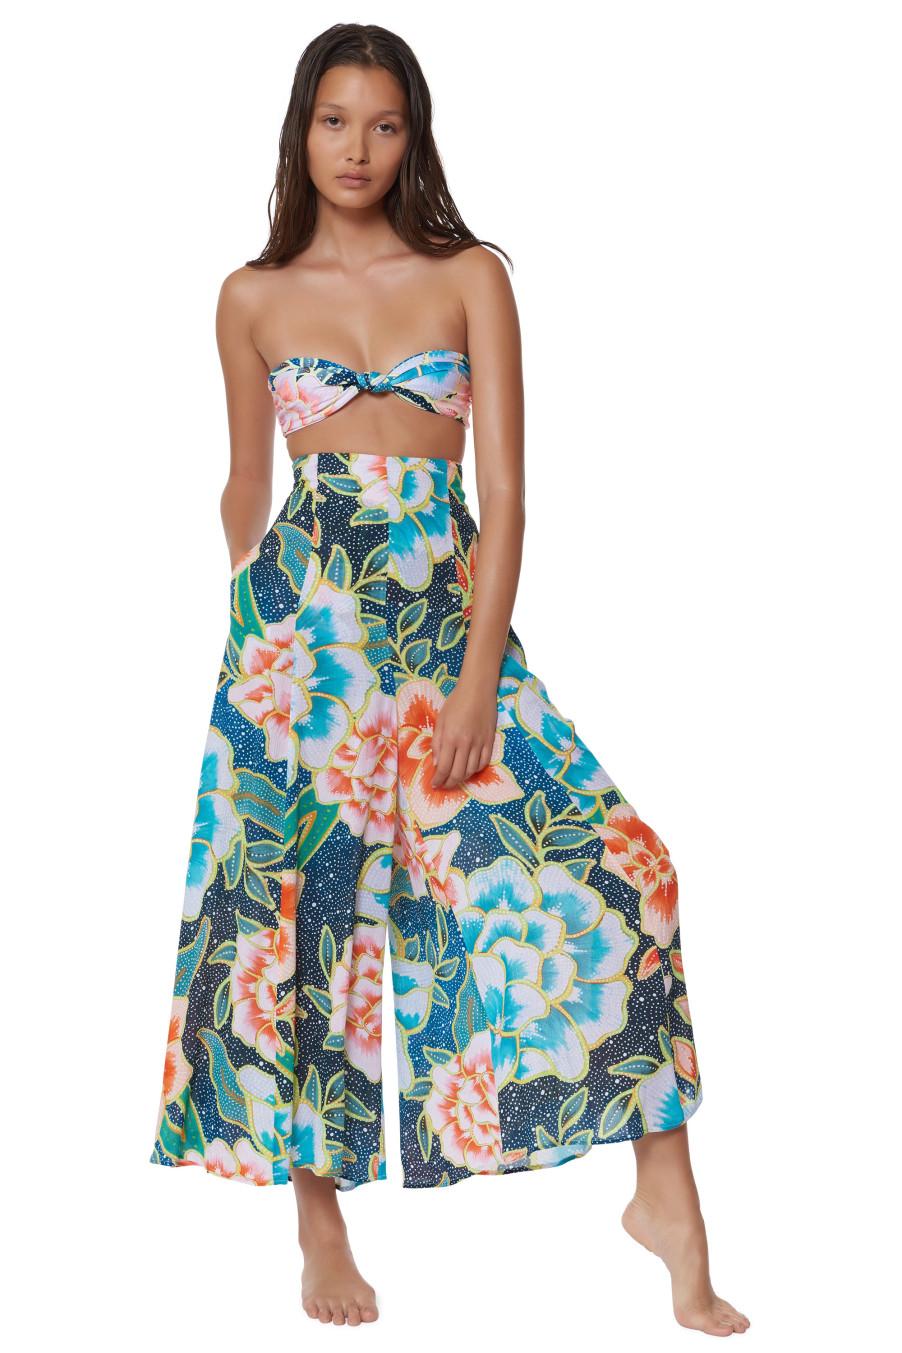 destiland-sexidesti-destination-wedding-bride-swimsuit-women-owned-swimwear-mara-hoffman-3.jpg